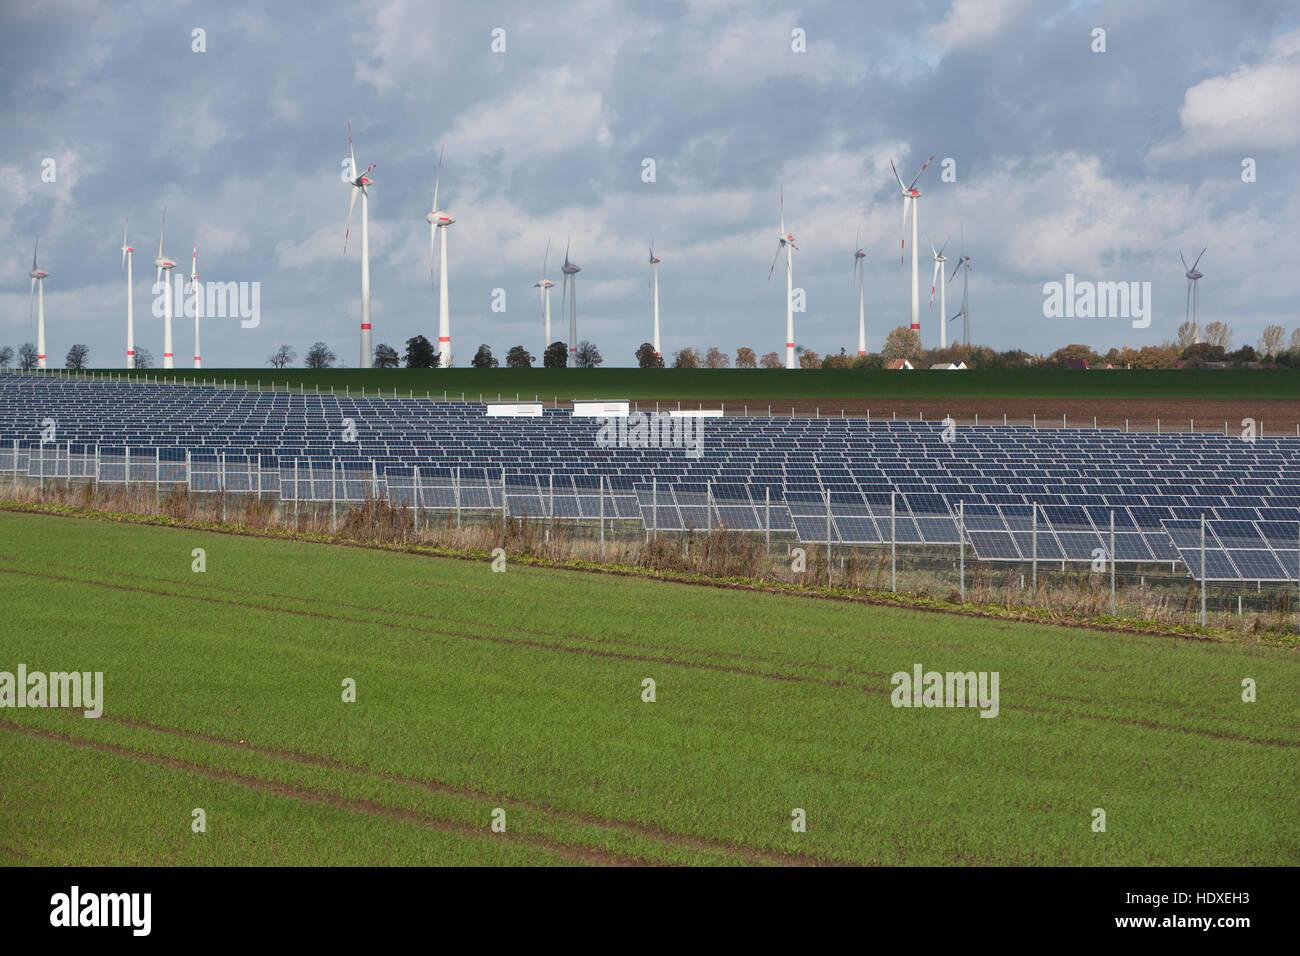 renewable energy at a20 motorway, mecklenburg-western pomerania, germany - Stock Image